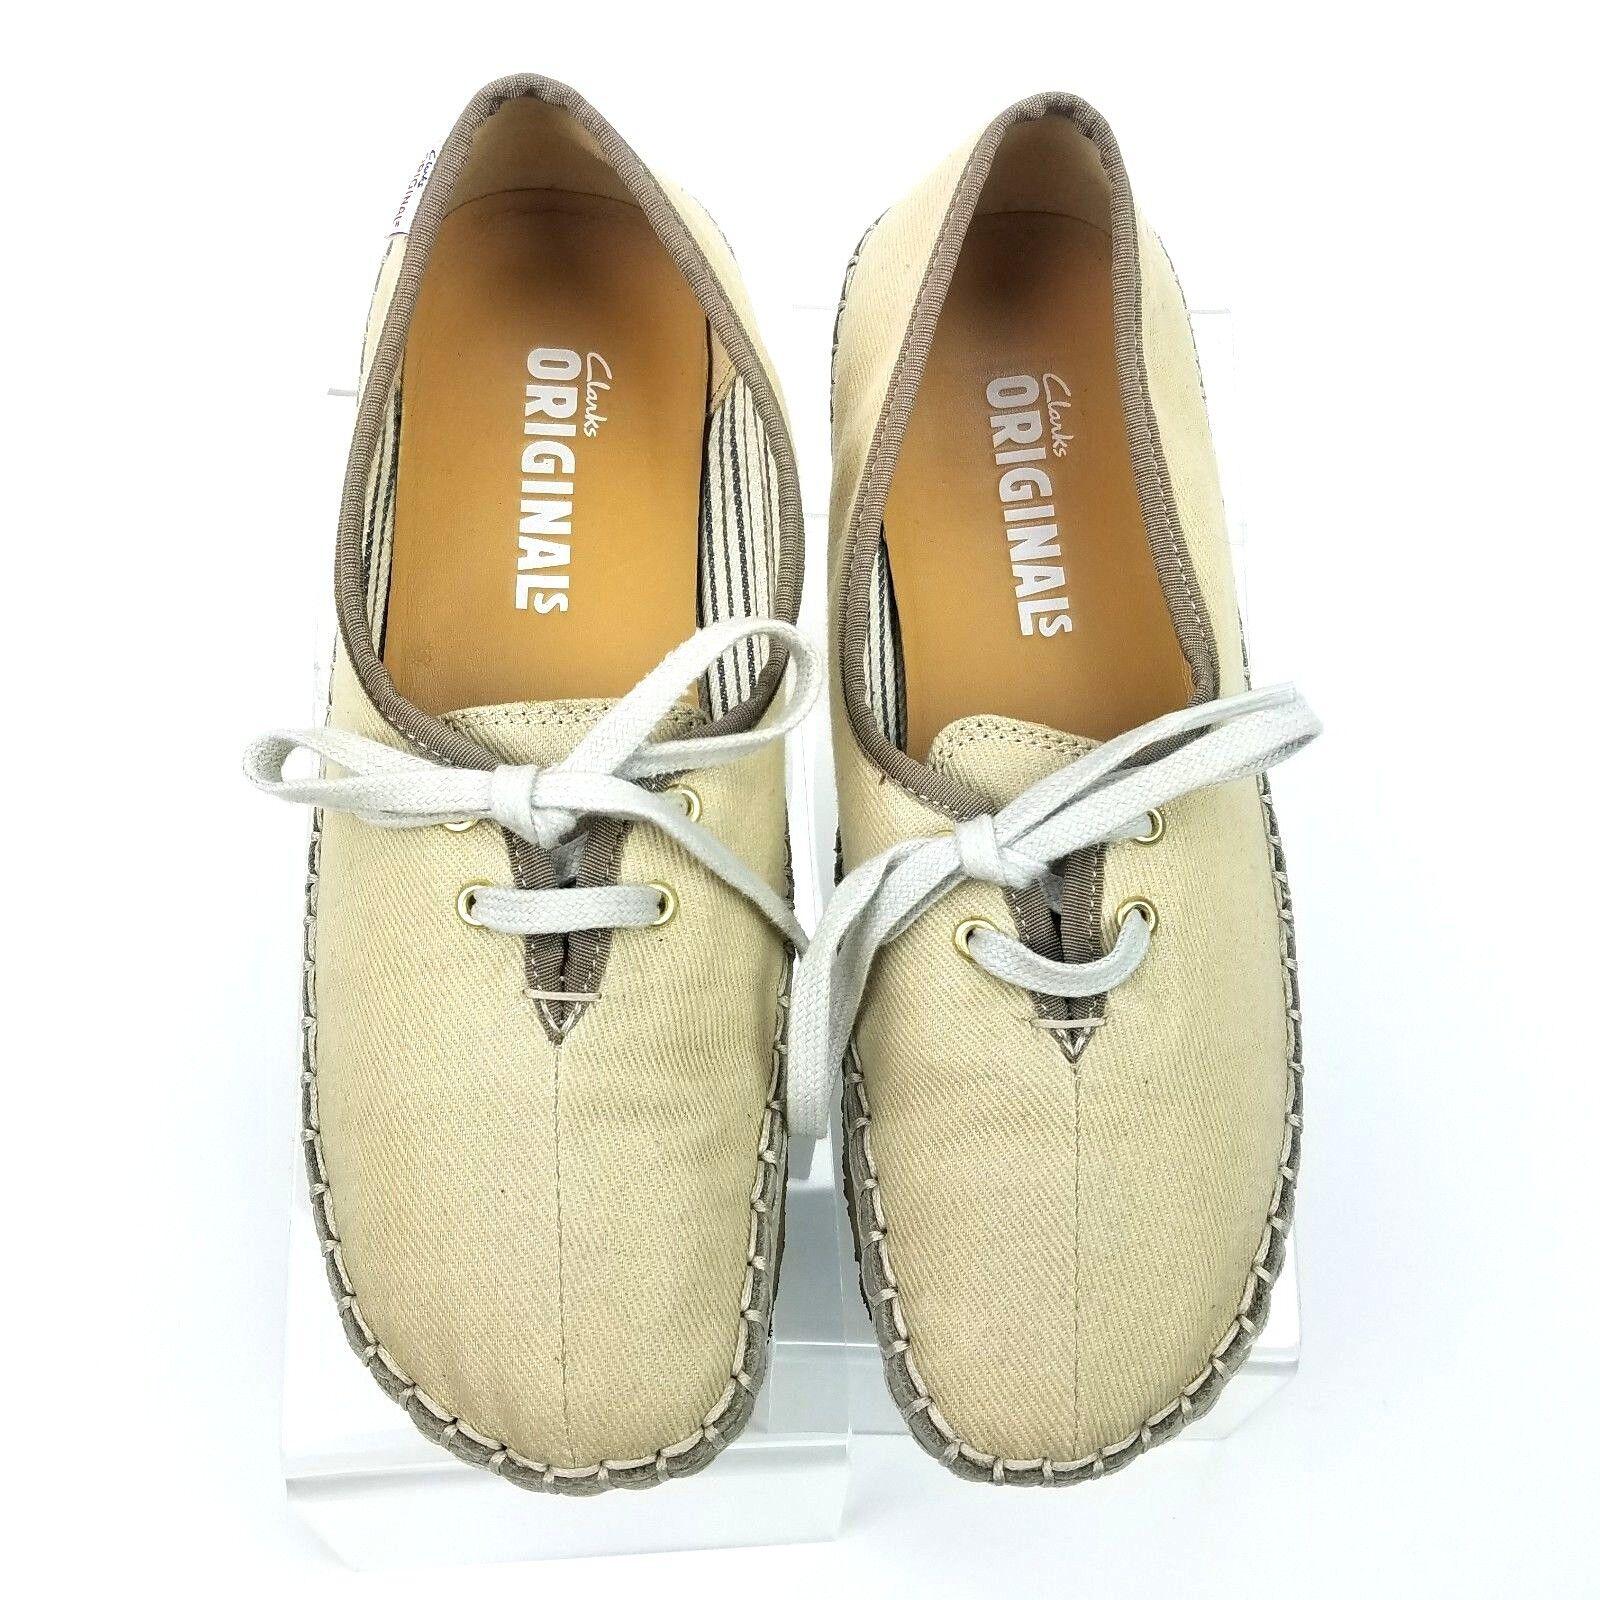 CLarks Originals Beige Canavs Crepe Sole Sneaker shoe US 7.5M 2 EYE